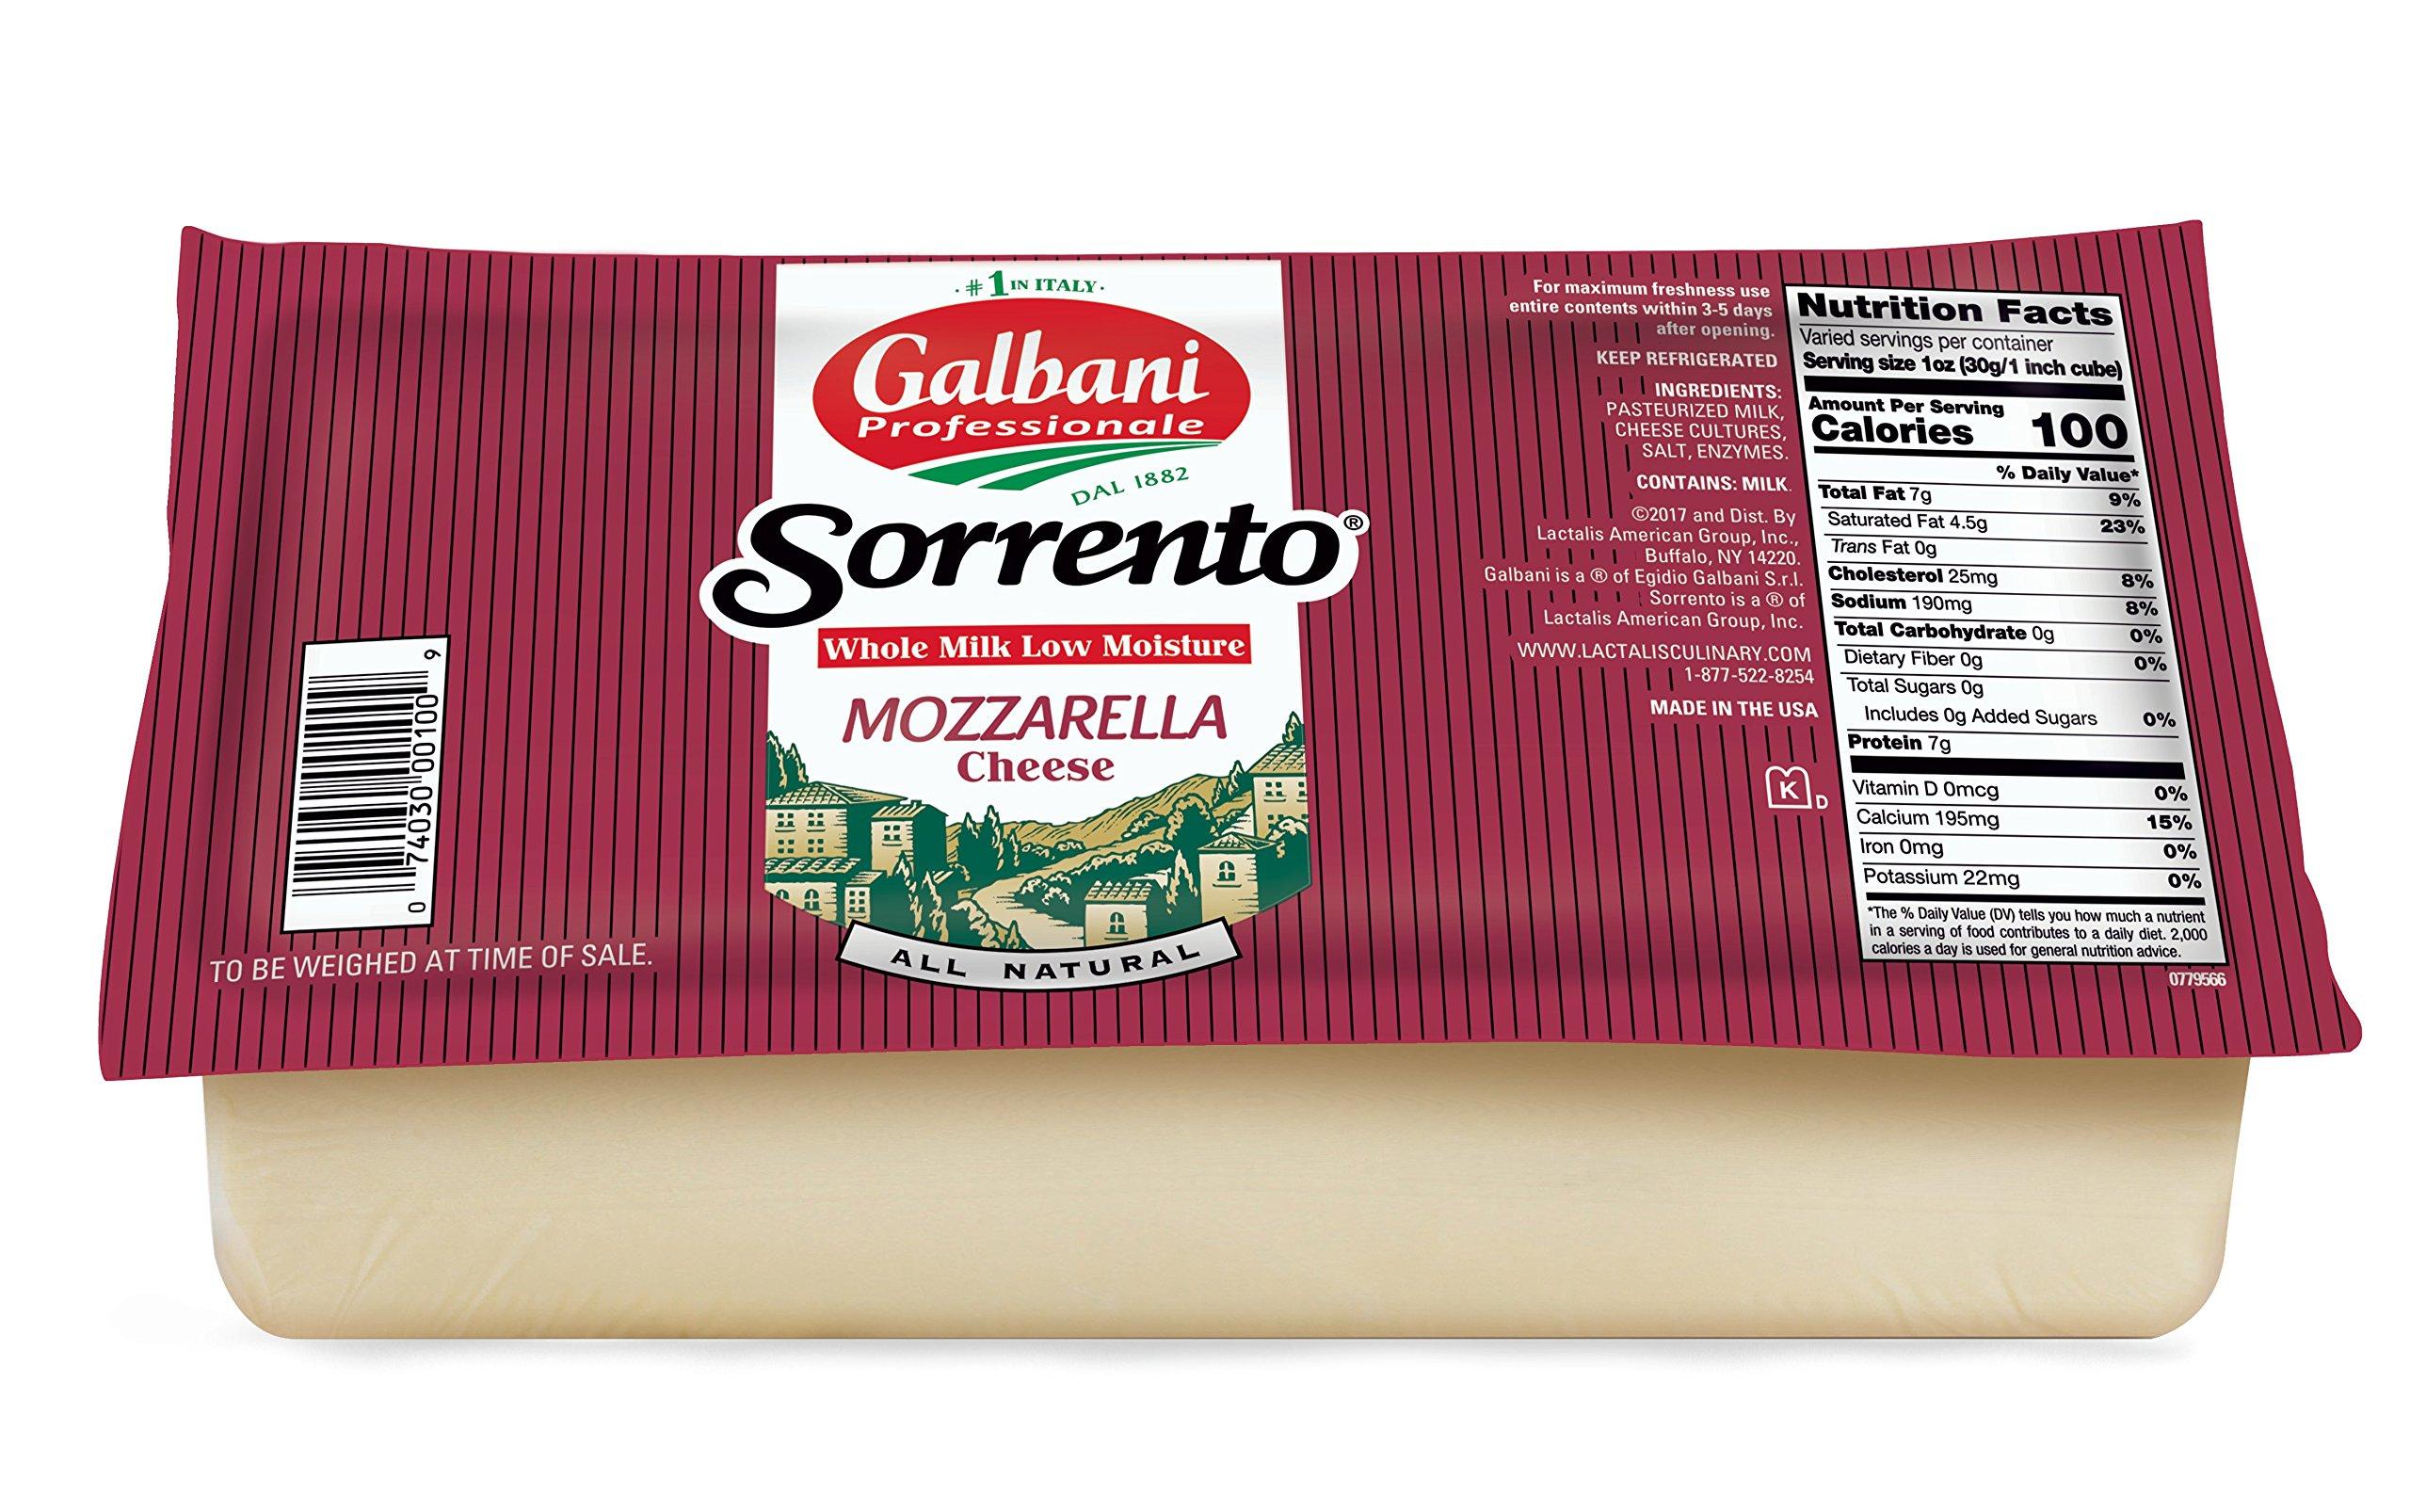 Galbani Whole Milk Low Moisture Mozzarella Block 5 lb, Pack of 8